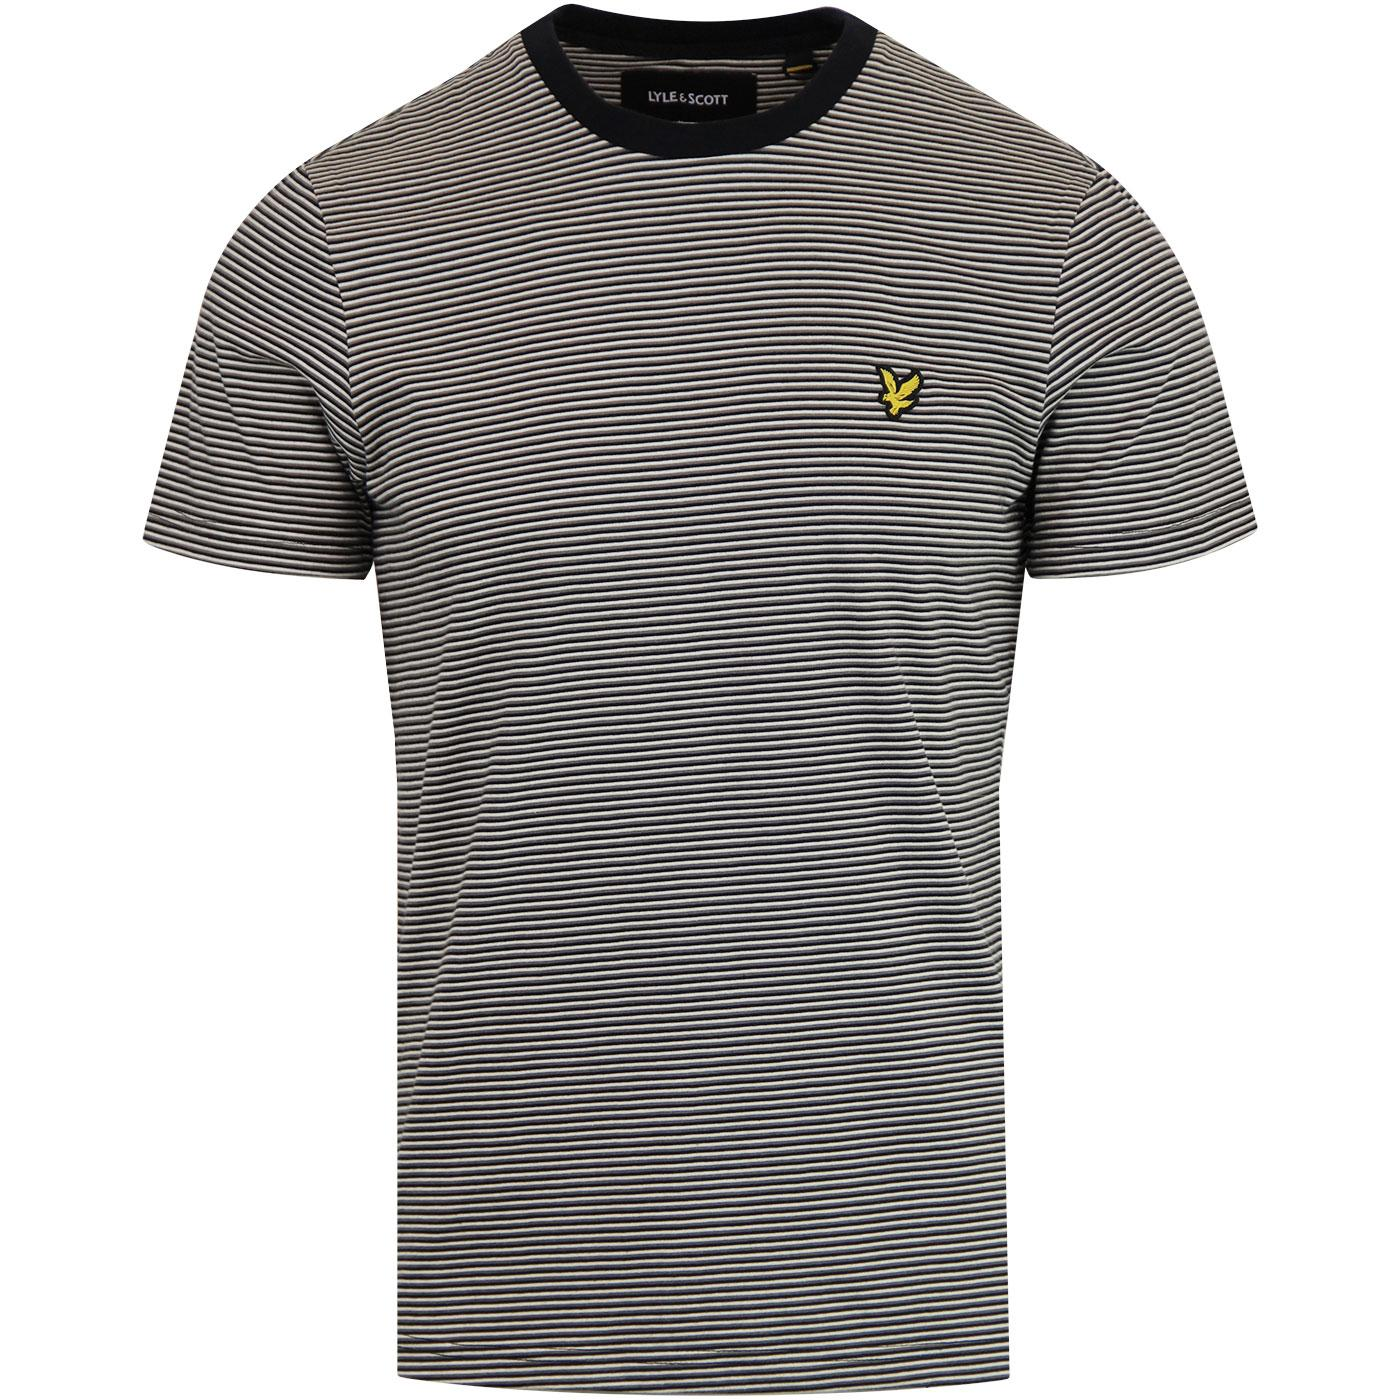 LYLE & SCOTT Men's Retro Feeder Stripe T-shirt TB